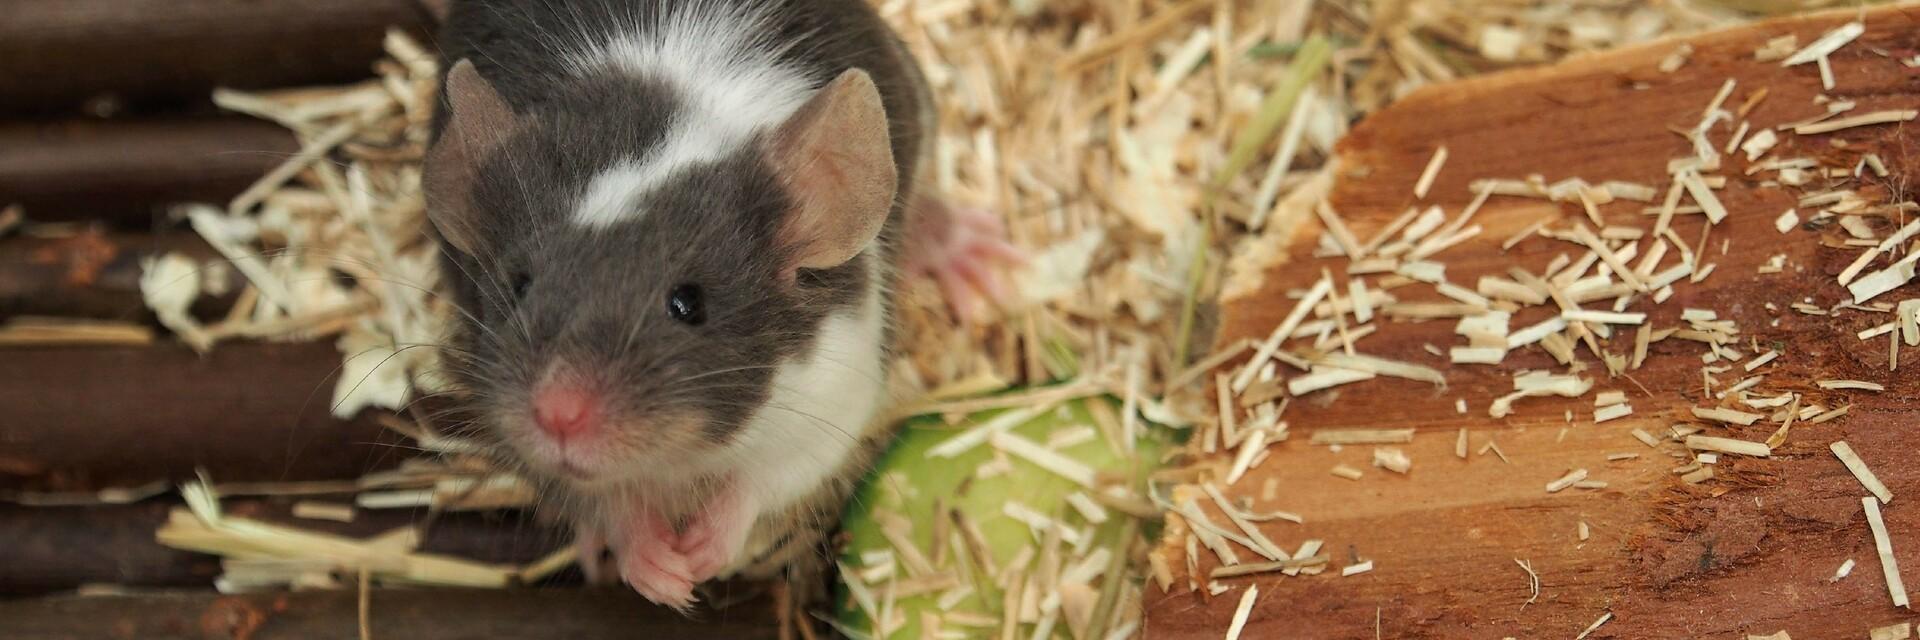 Pet mice - No easy pets